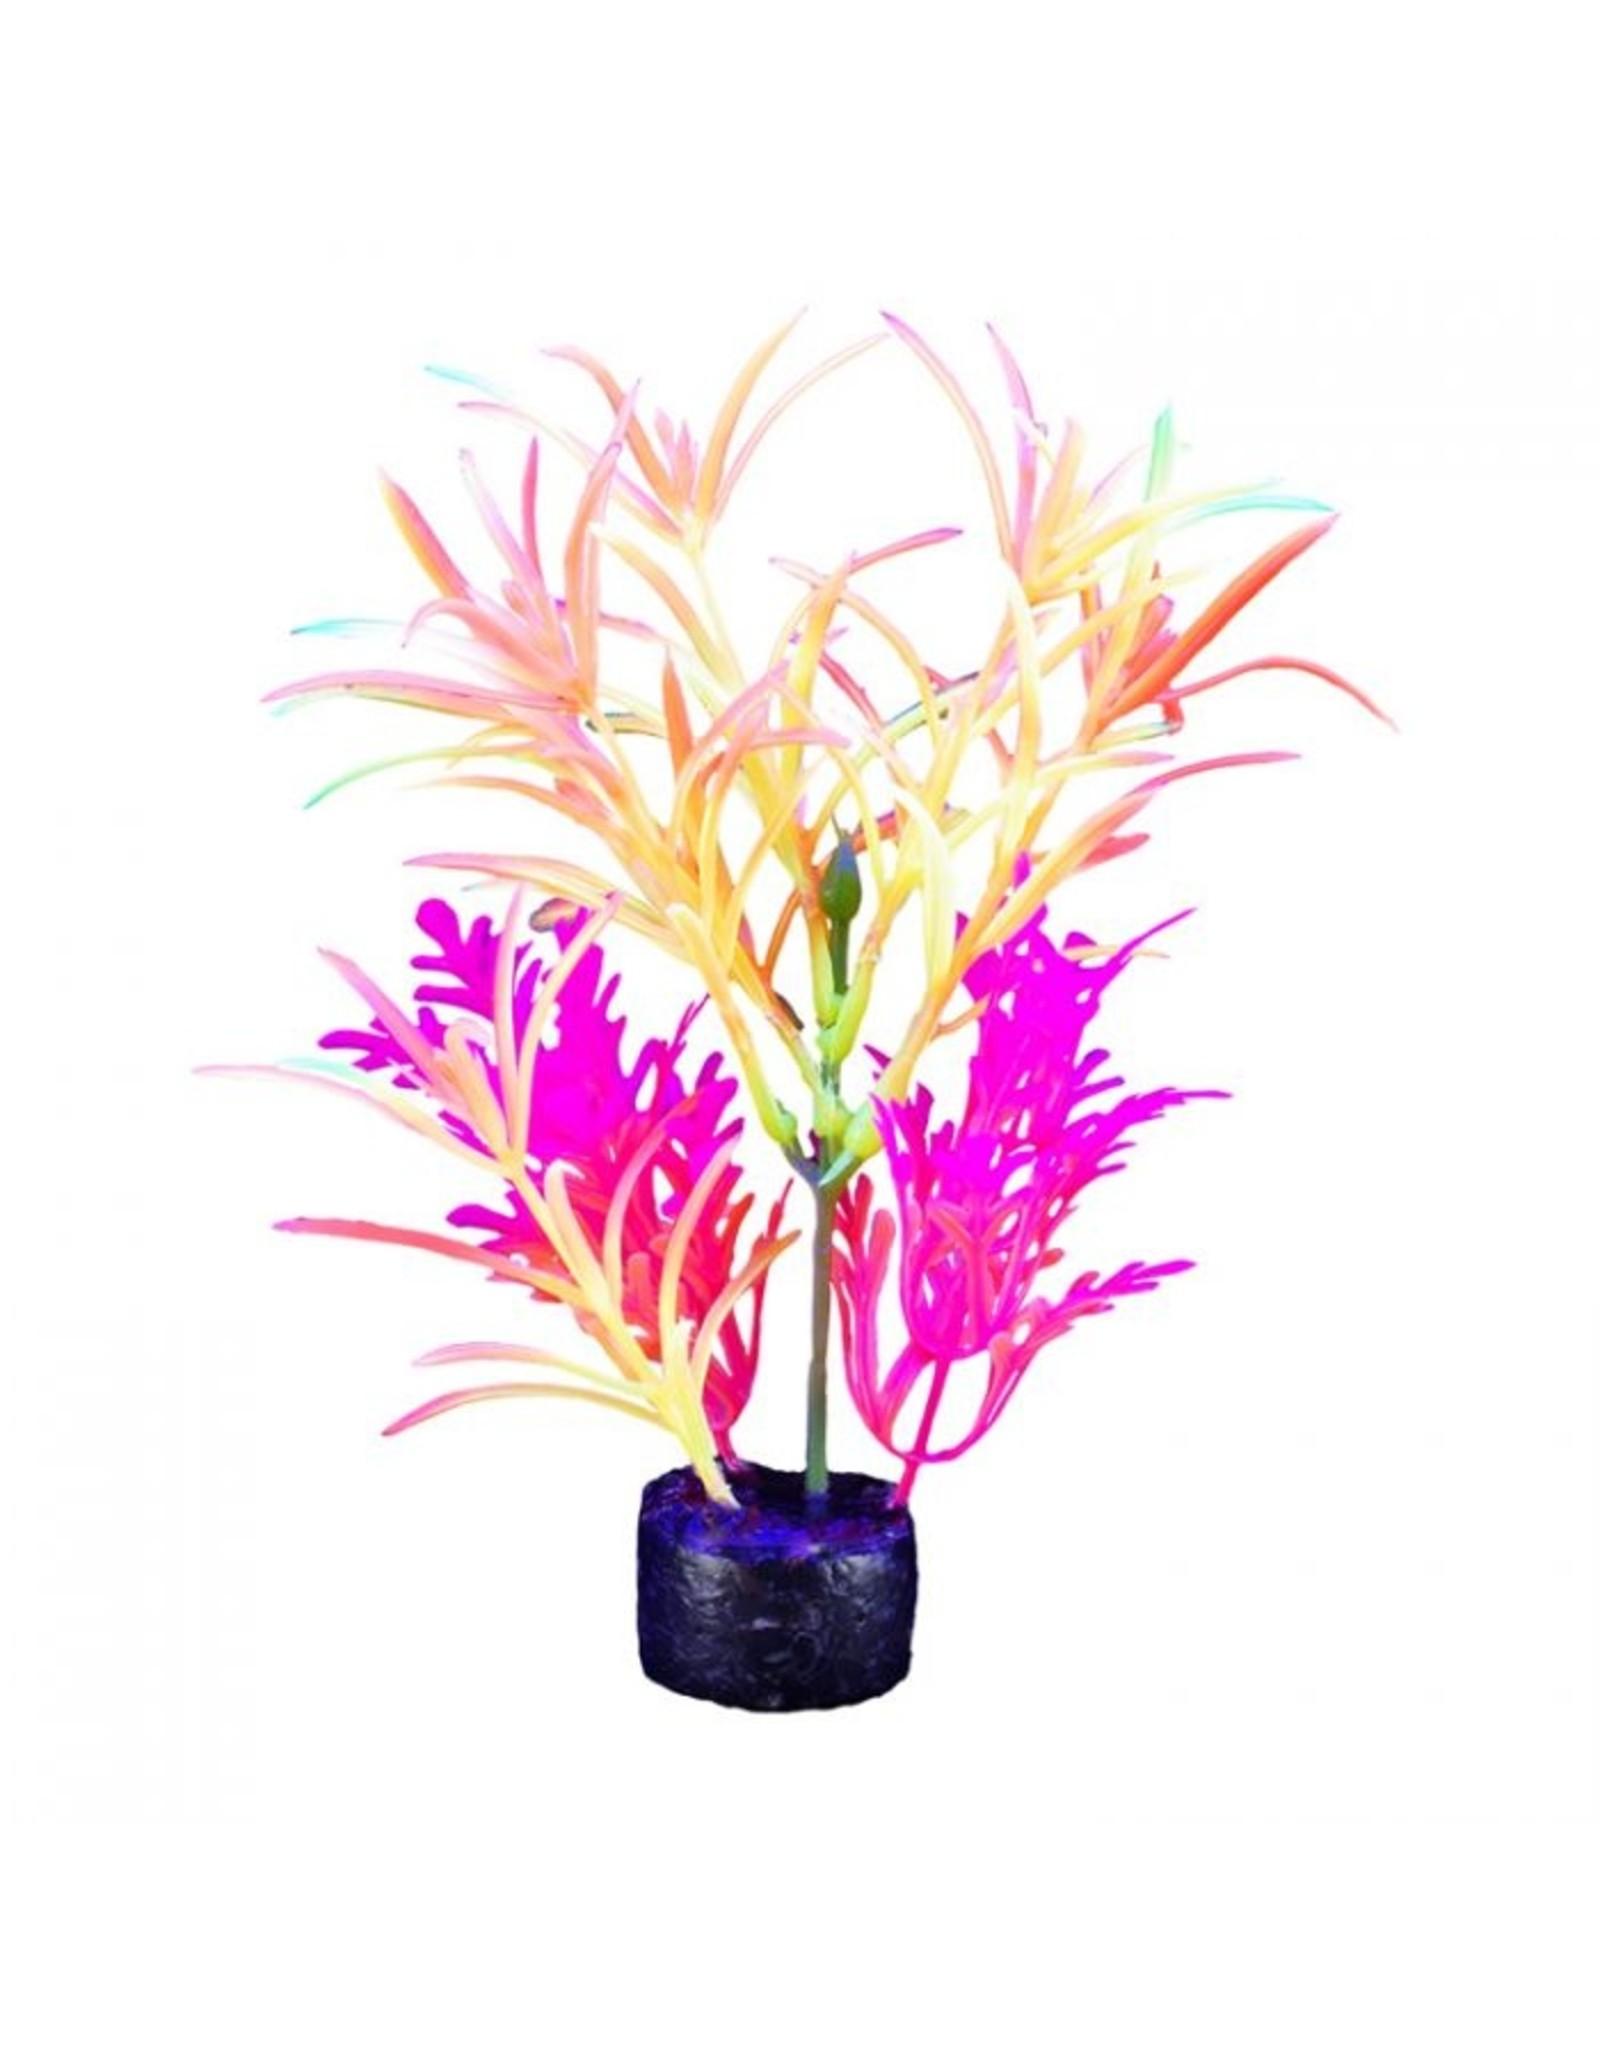 "Marina Marina iGlo Plant - 7.5"" - Orange/Yellow/Pink"